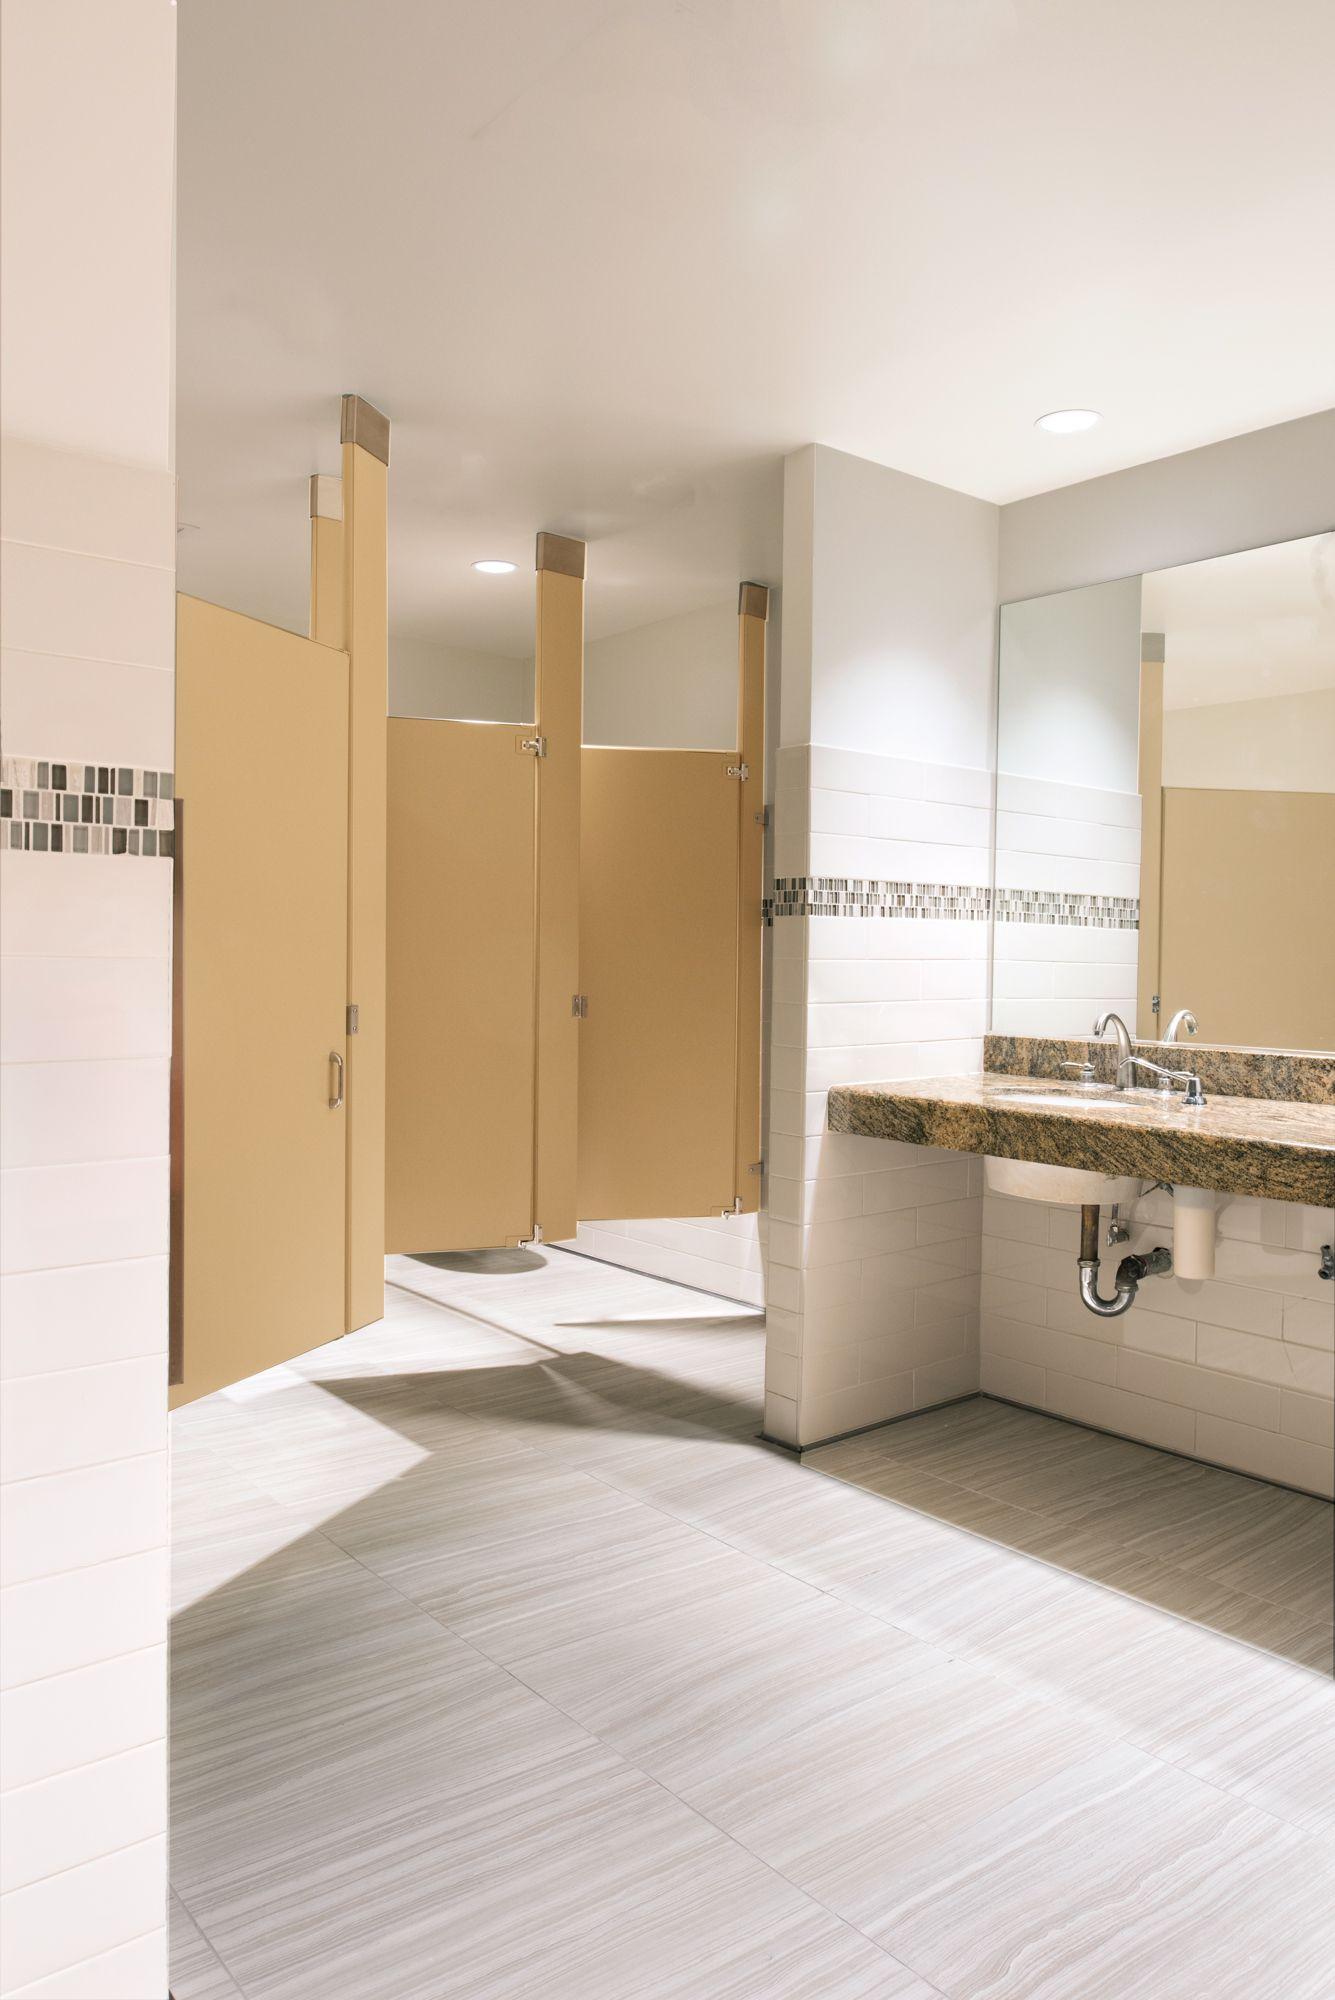 Modernization of twenty public restrooms in a commercial